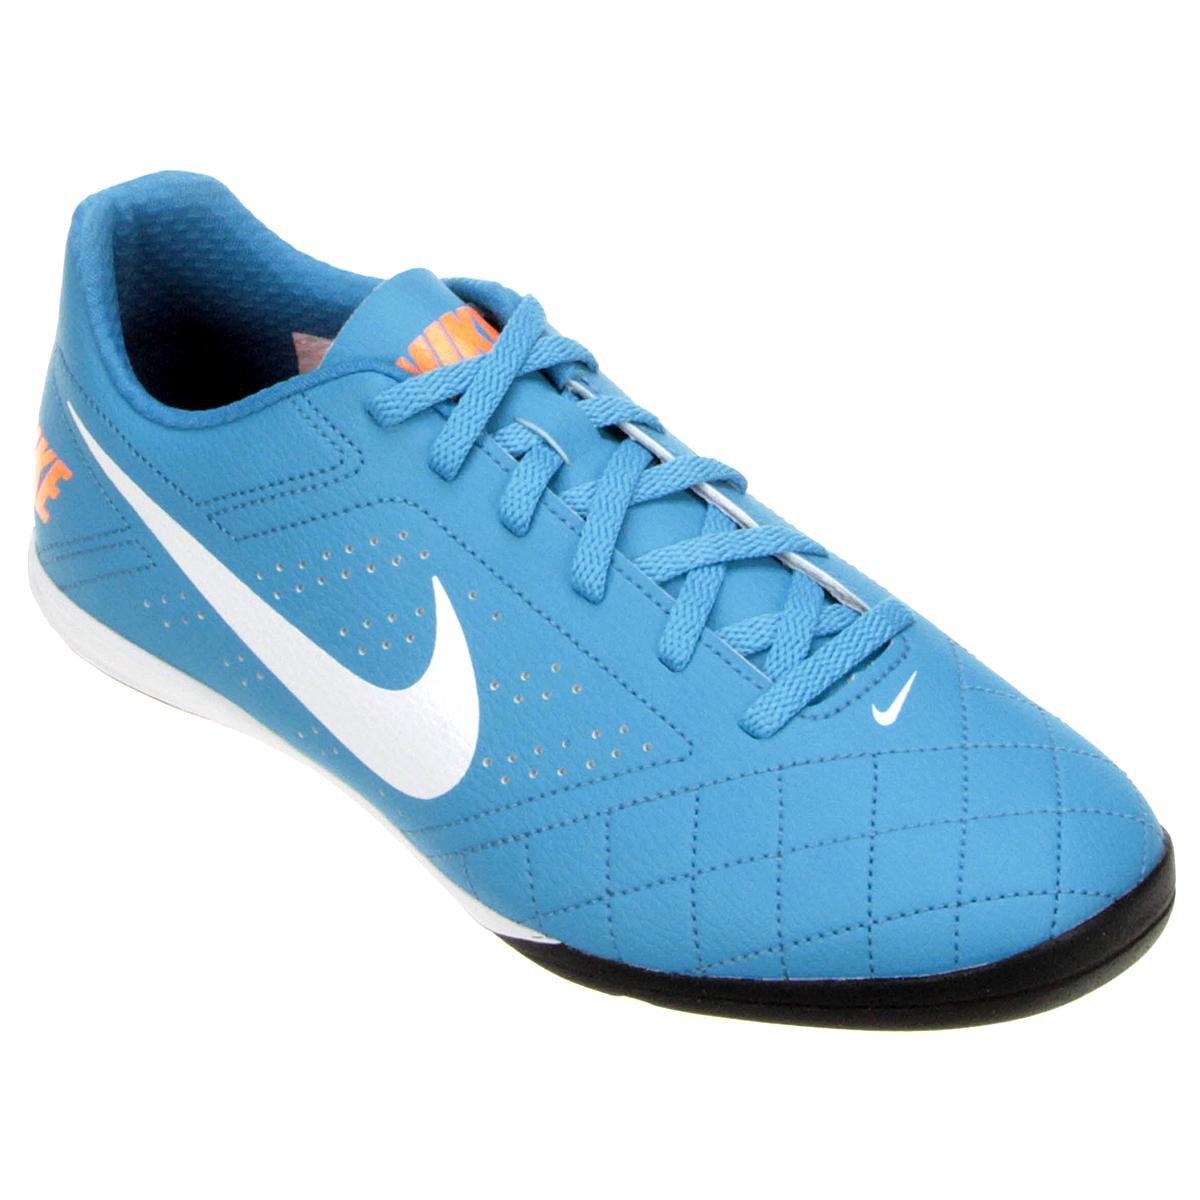 f613a3d296 Chuteira Futsal Nike Beco 2 Futsal - Azul e Branco - Compre Agora ...